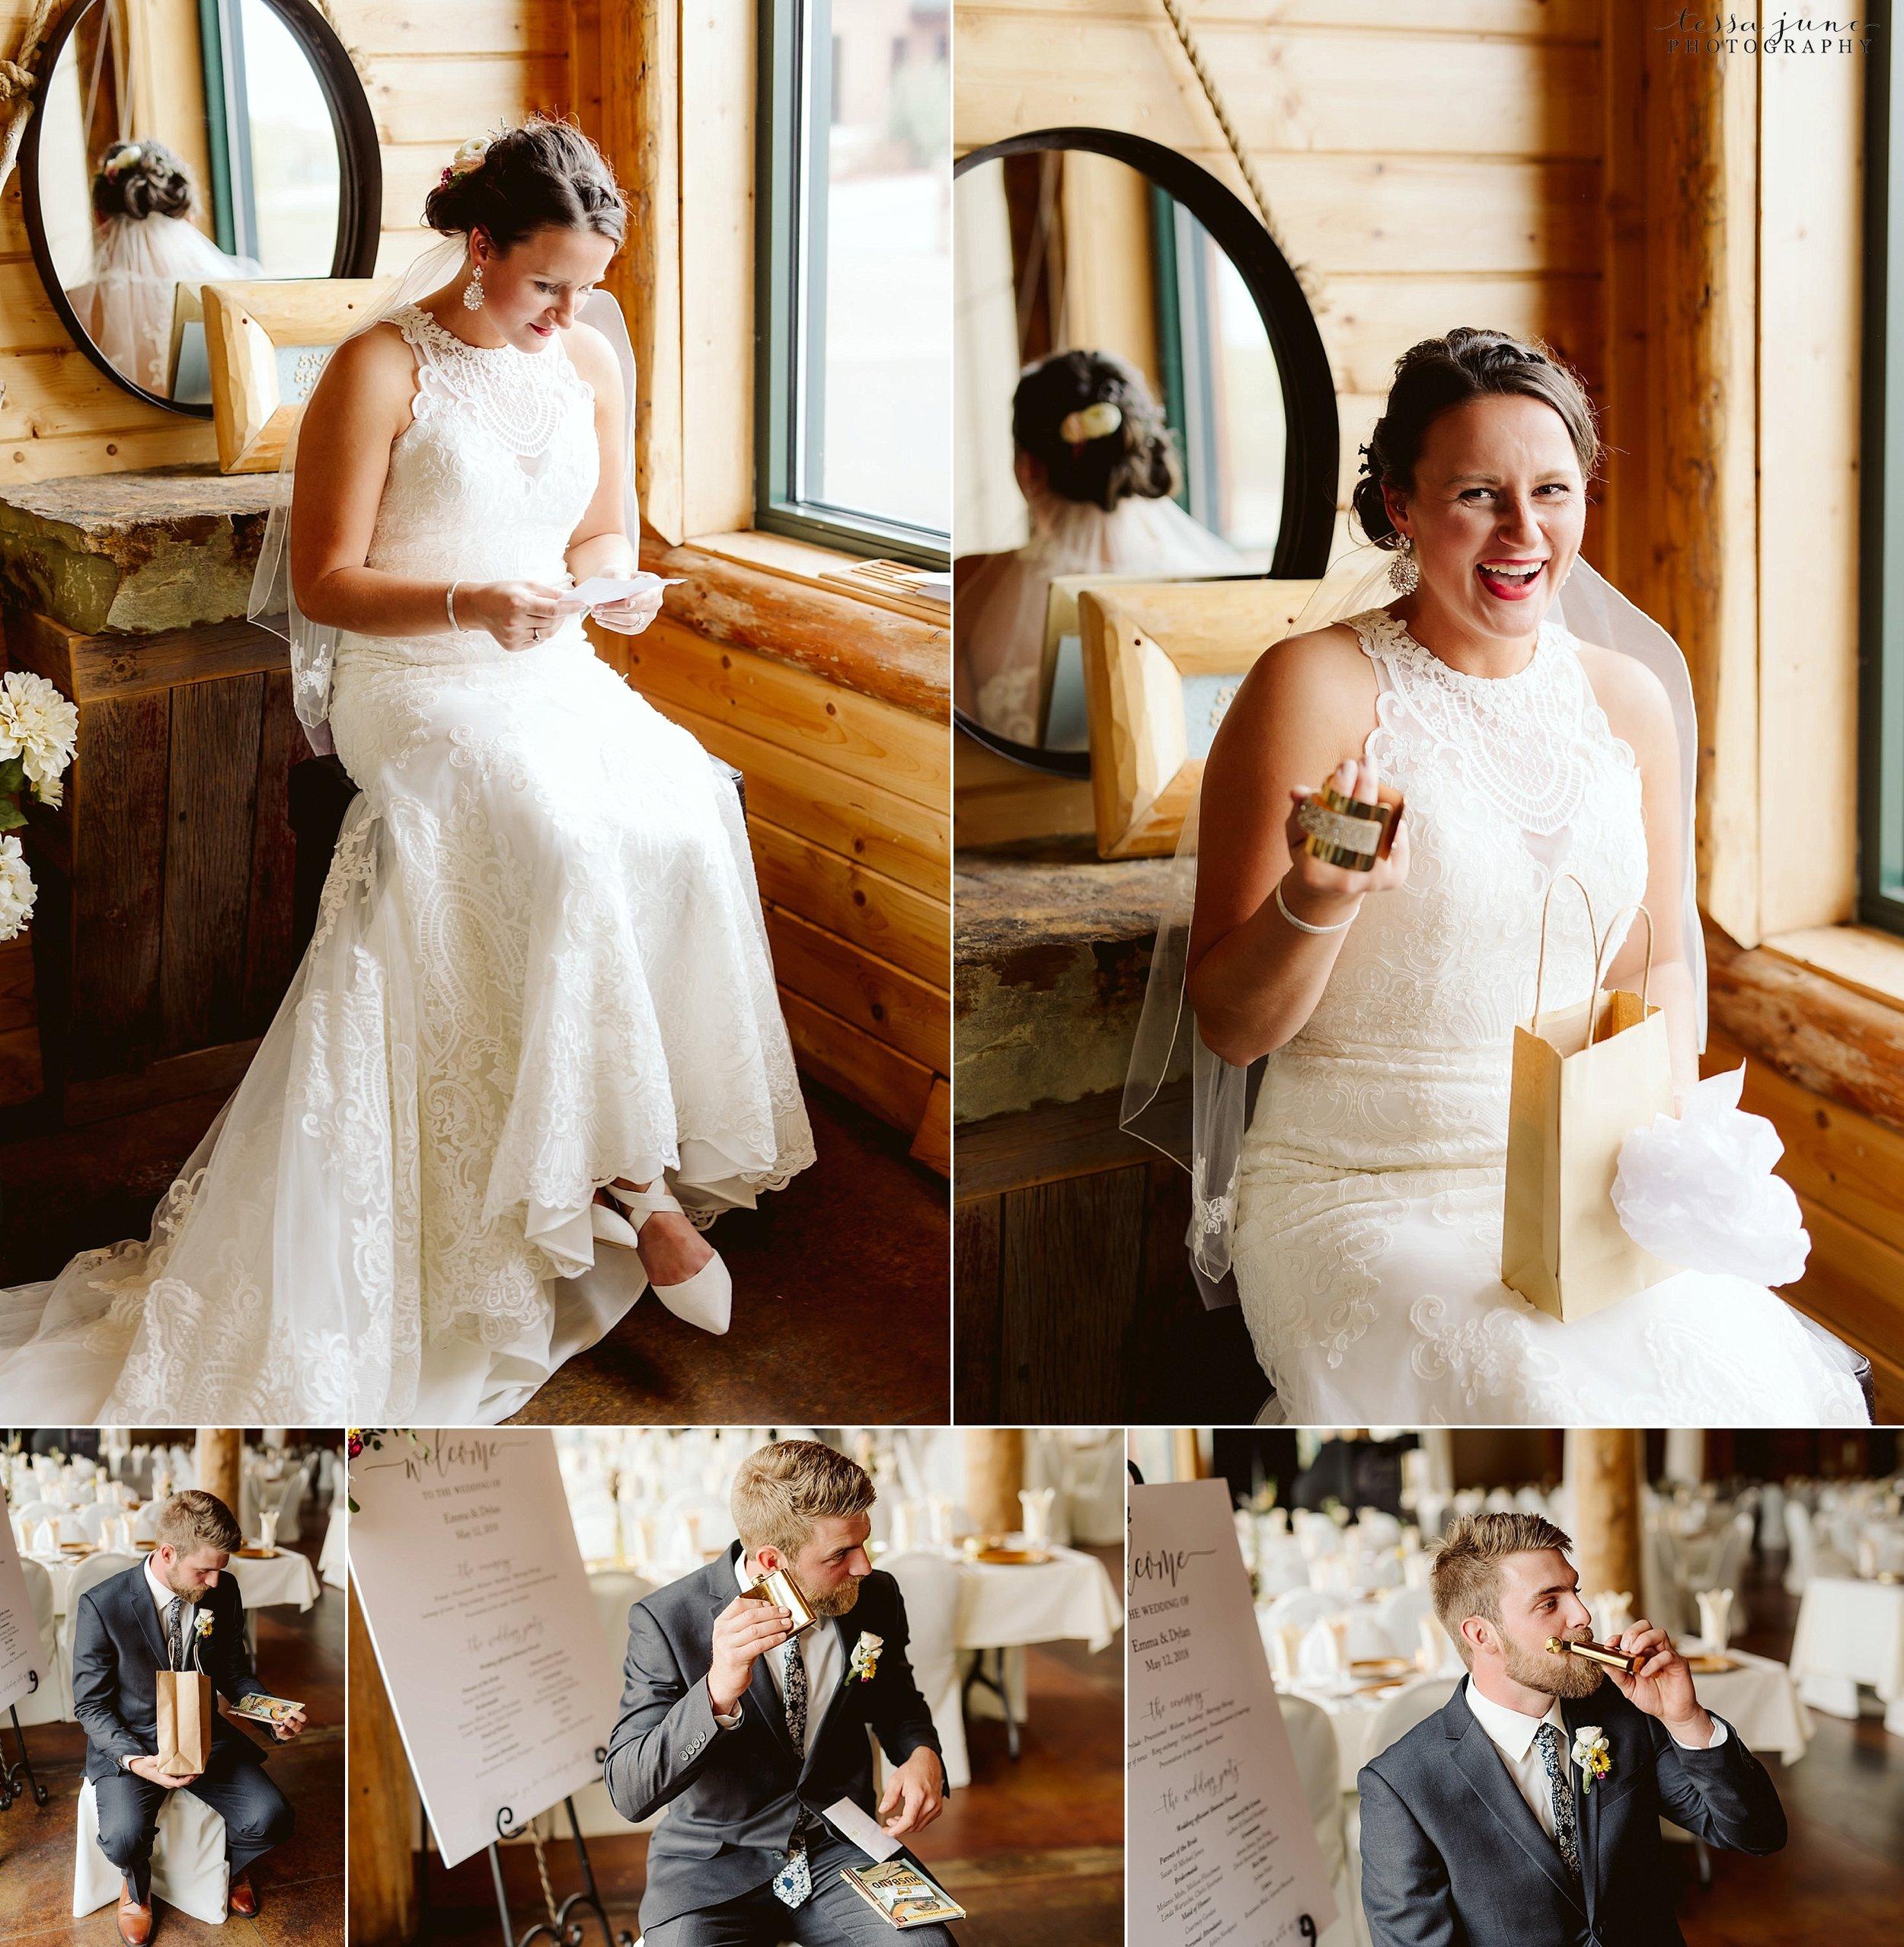 The-grands-at-mulligans-wedding-sartell-minnesota-spring-floral-spring-garden-wedding-33.jpg